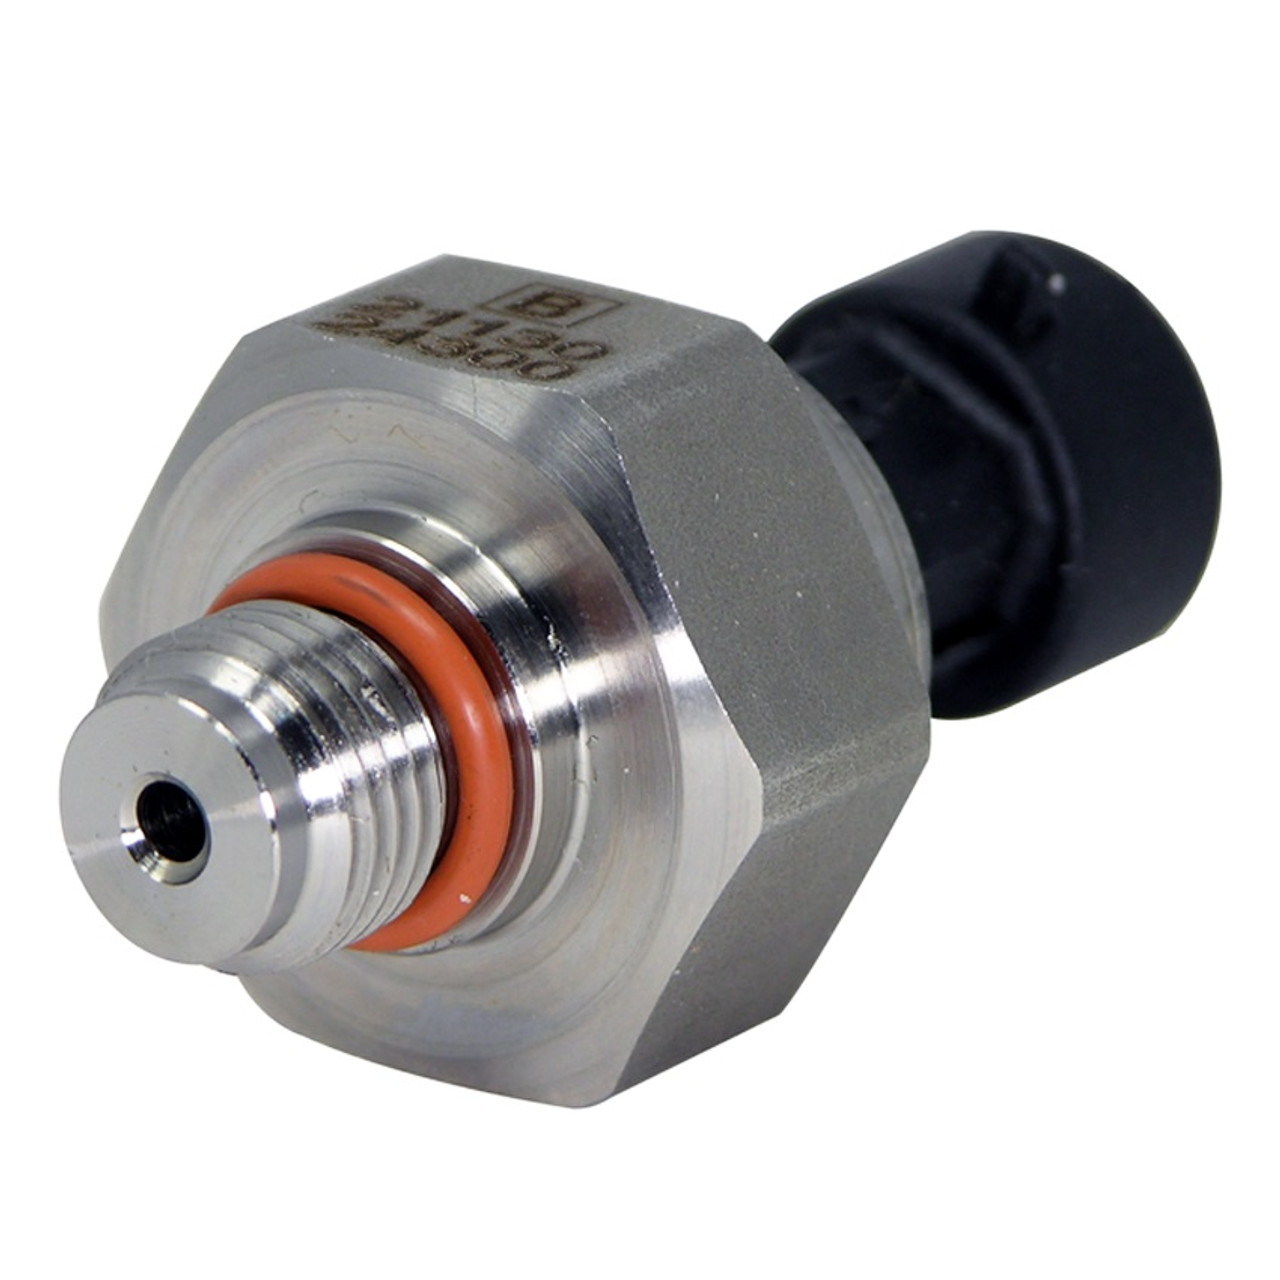 Injector Control Pressure Sensor ICP For 2000-2003 Ford Excursion F650 F750 7.3L